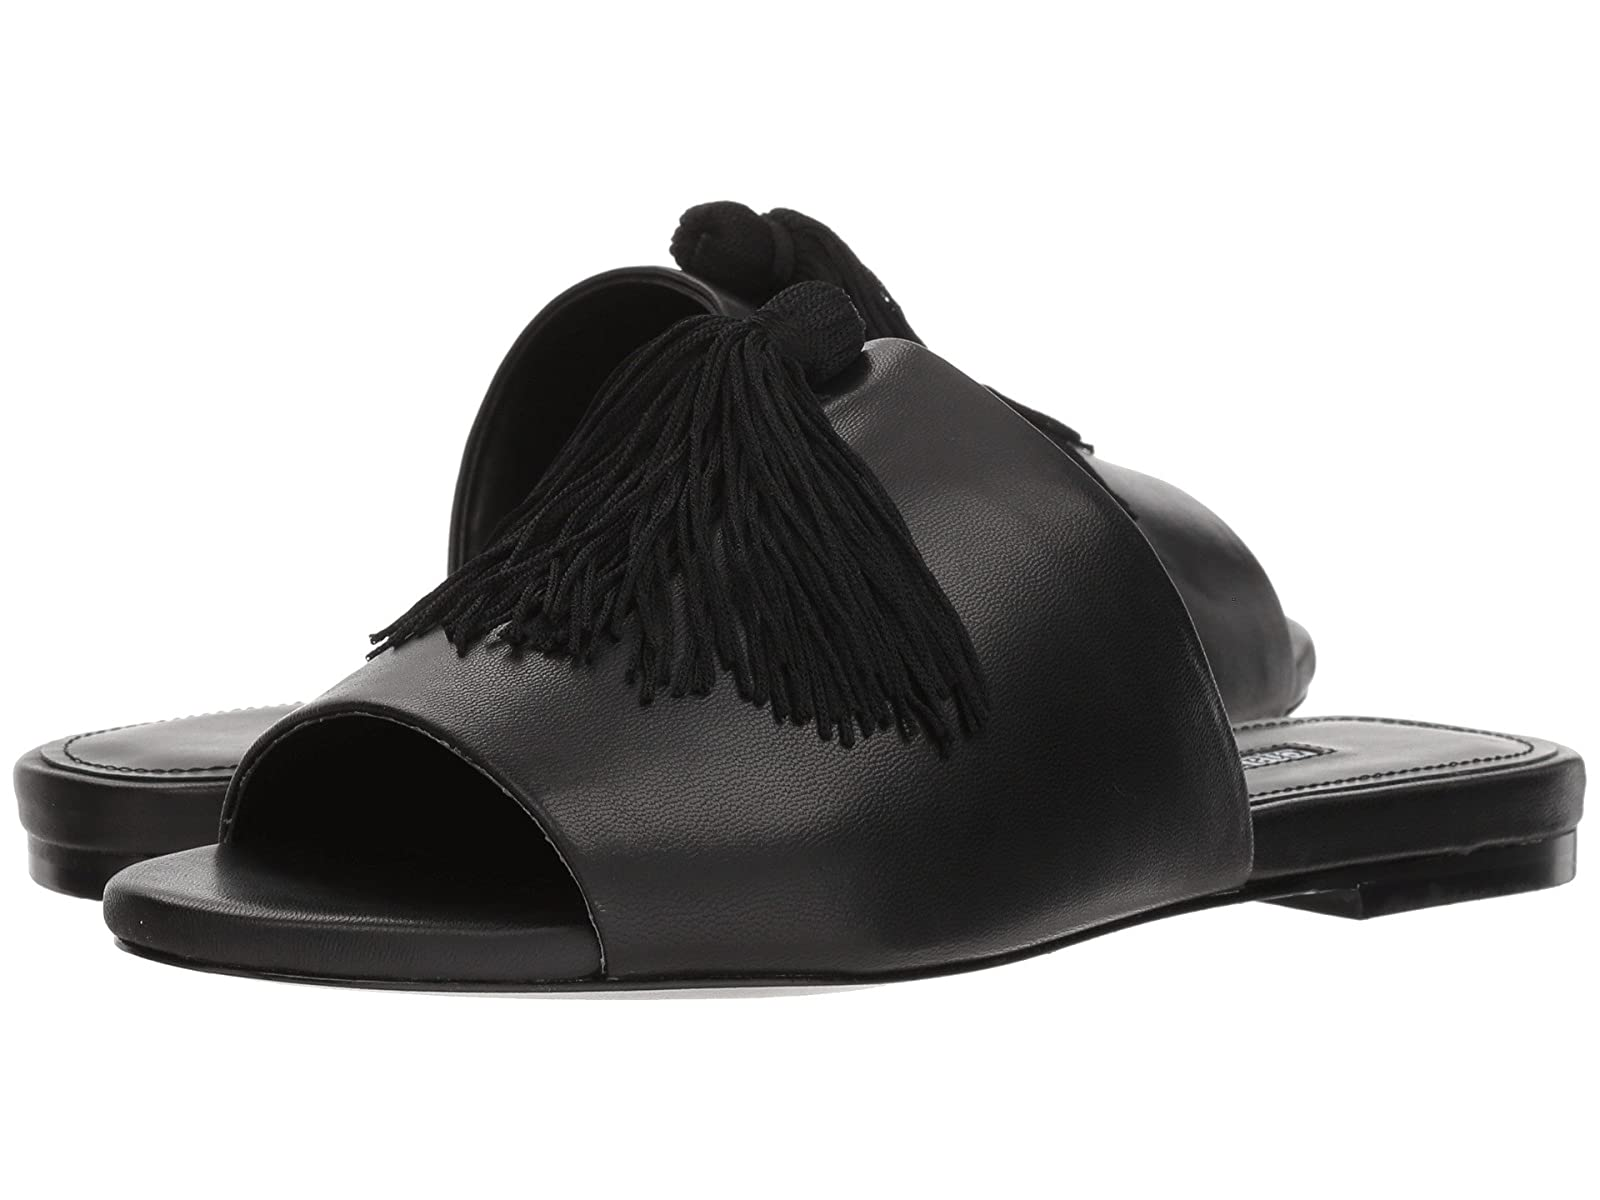 Charles by Charles David SashayCheap and distinctive eye-catching shoes